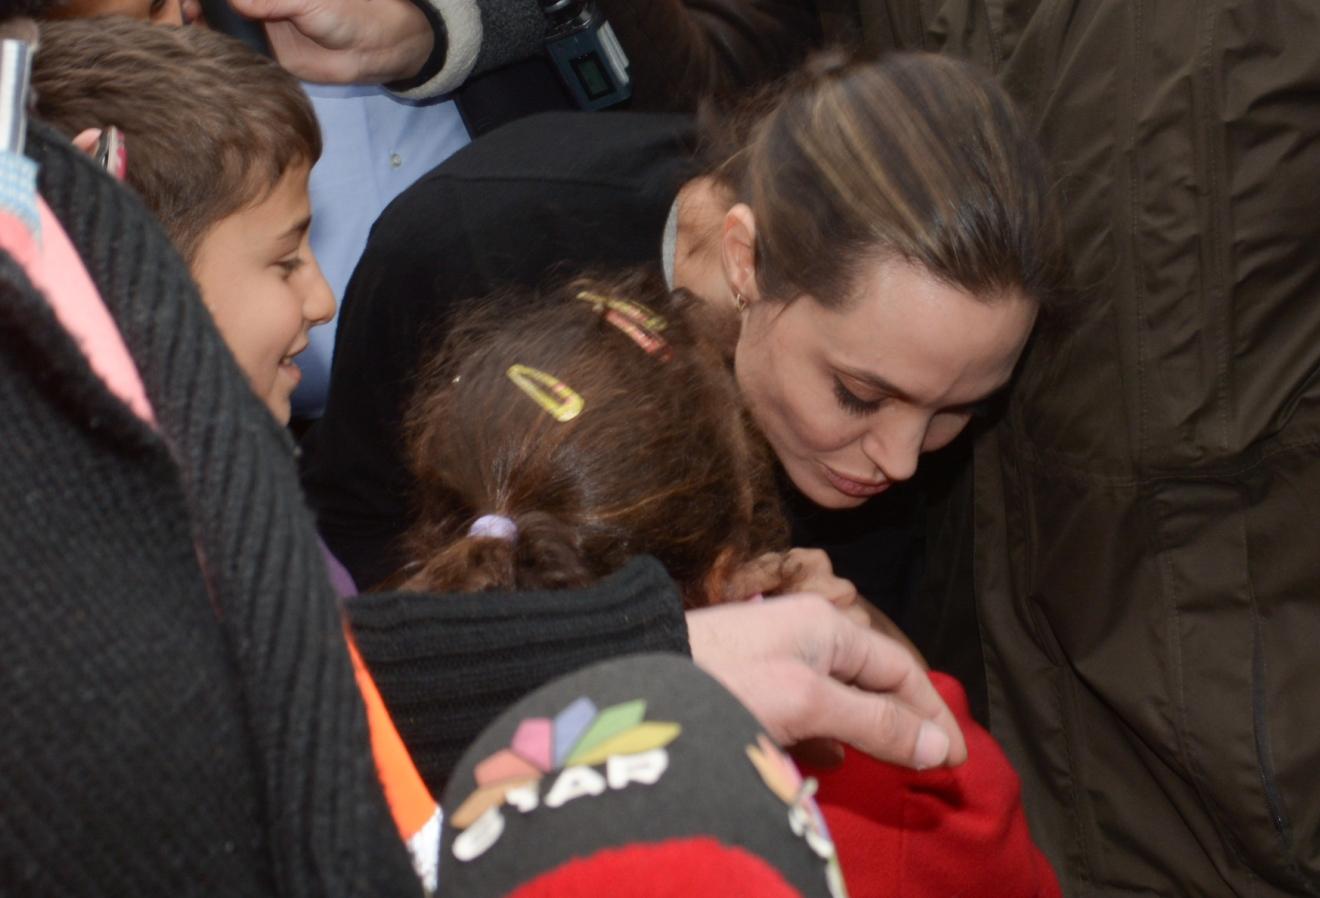 U N Goodwill Ambador Angelina Jolie Visits Piraeus To Speak Refugees During Her Visit Greece